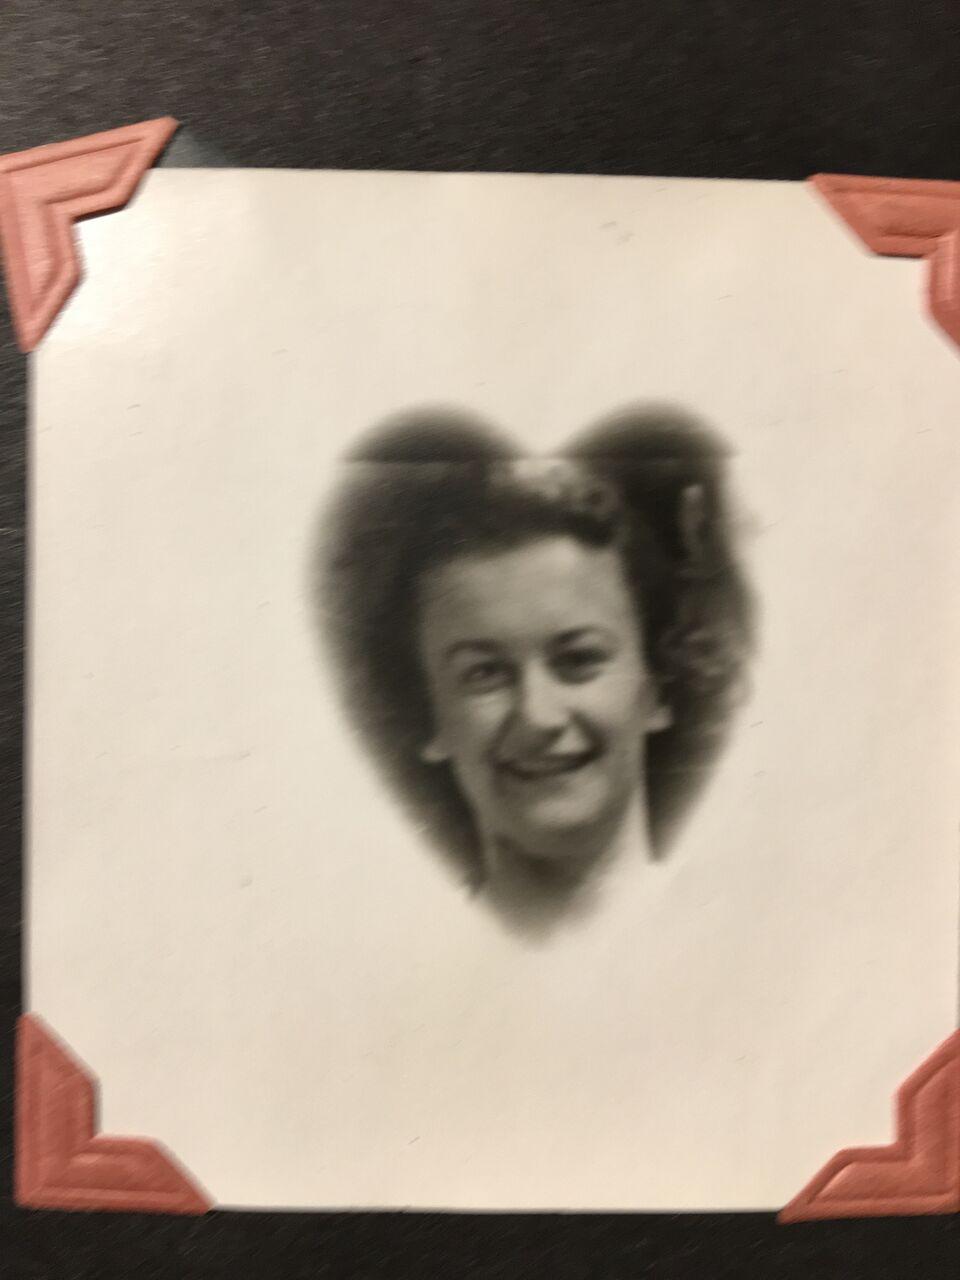 feb 2 1940 heart 1